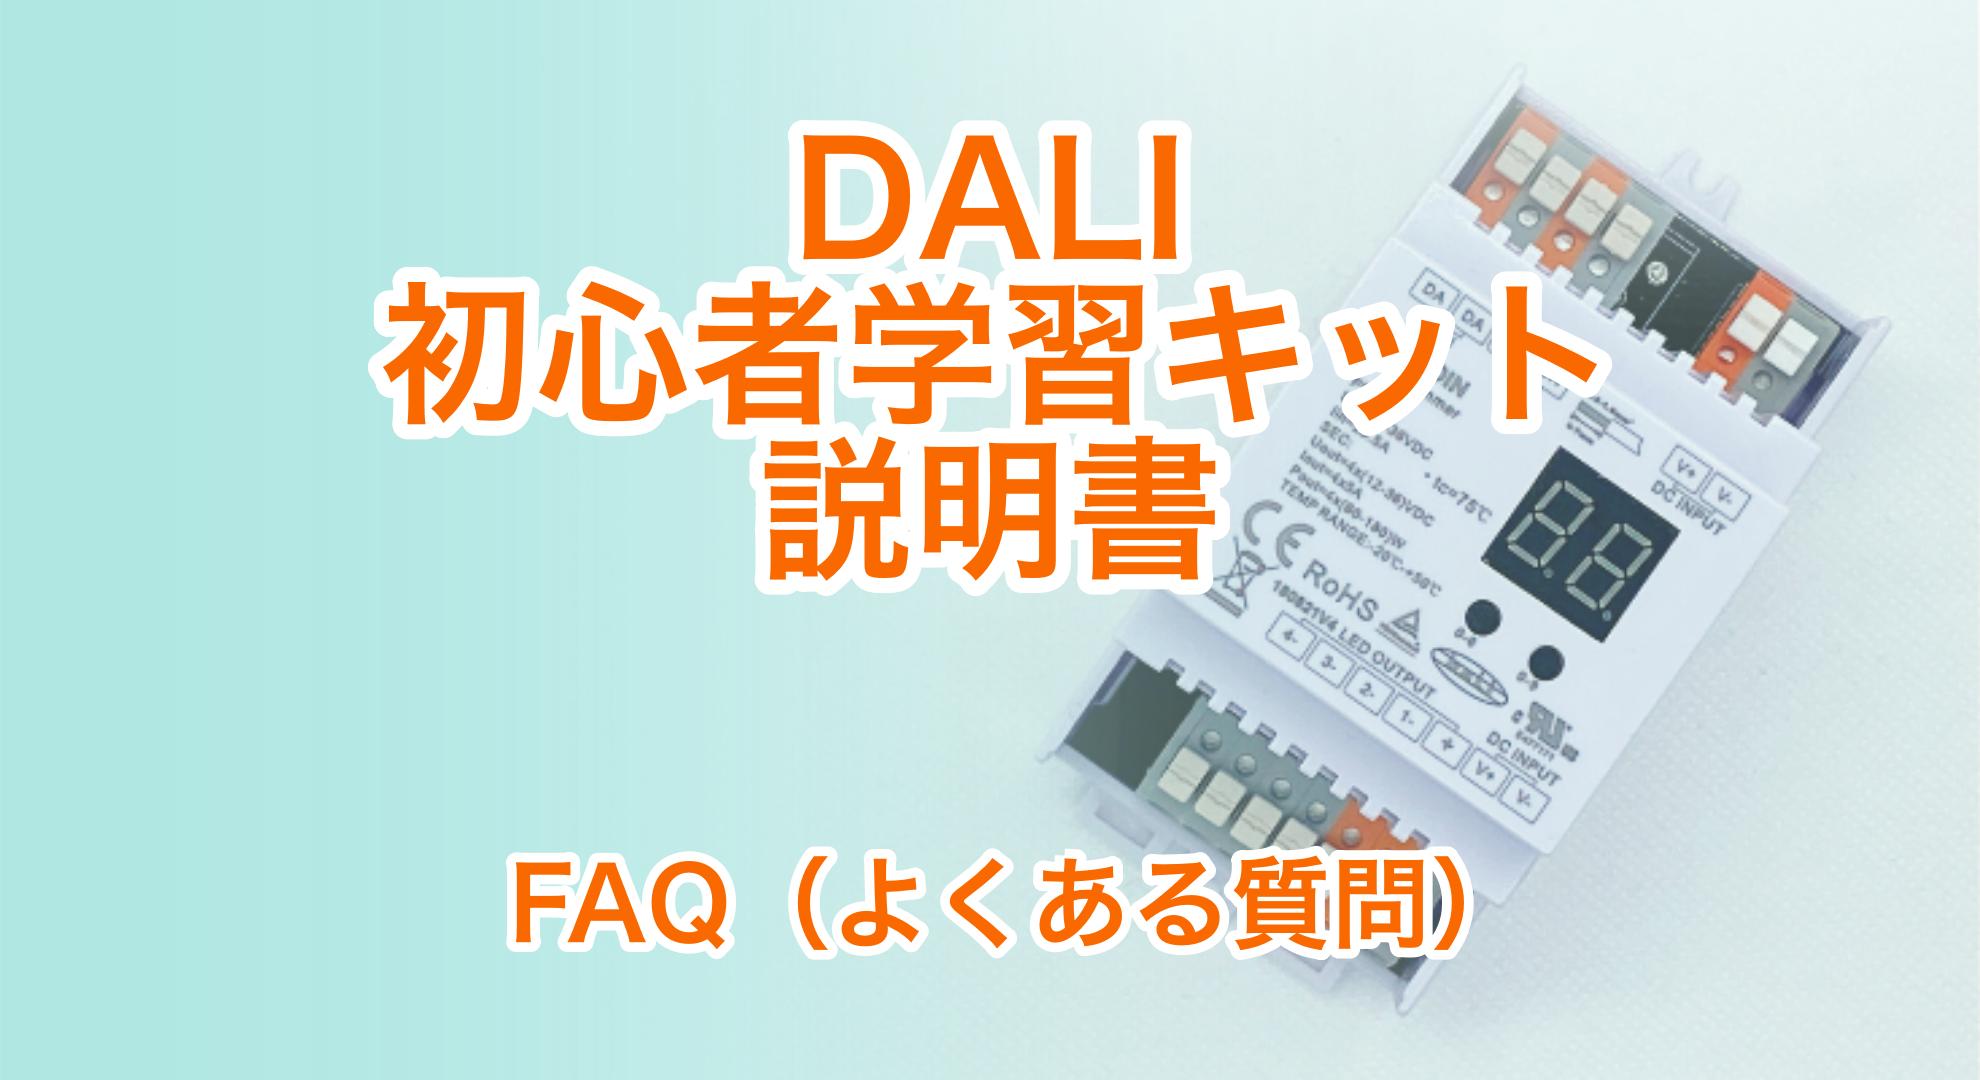 DALI初心者学習キットのよくある質問(FAQ)